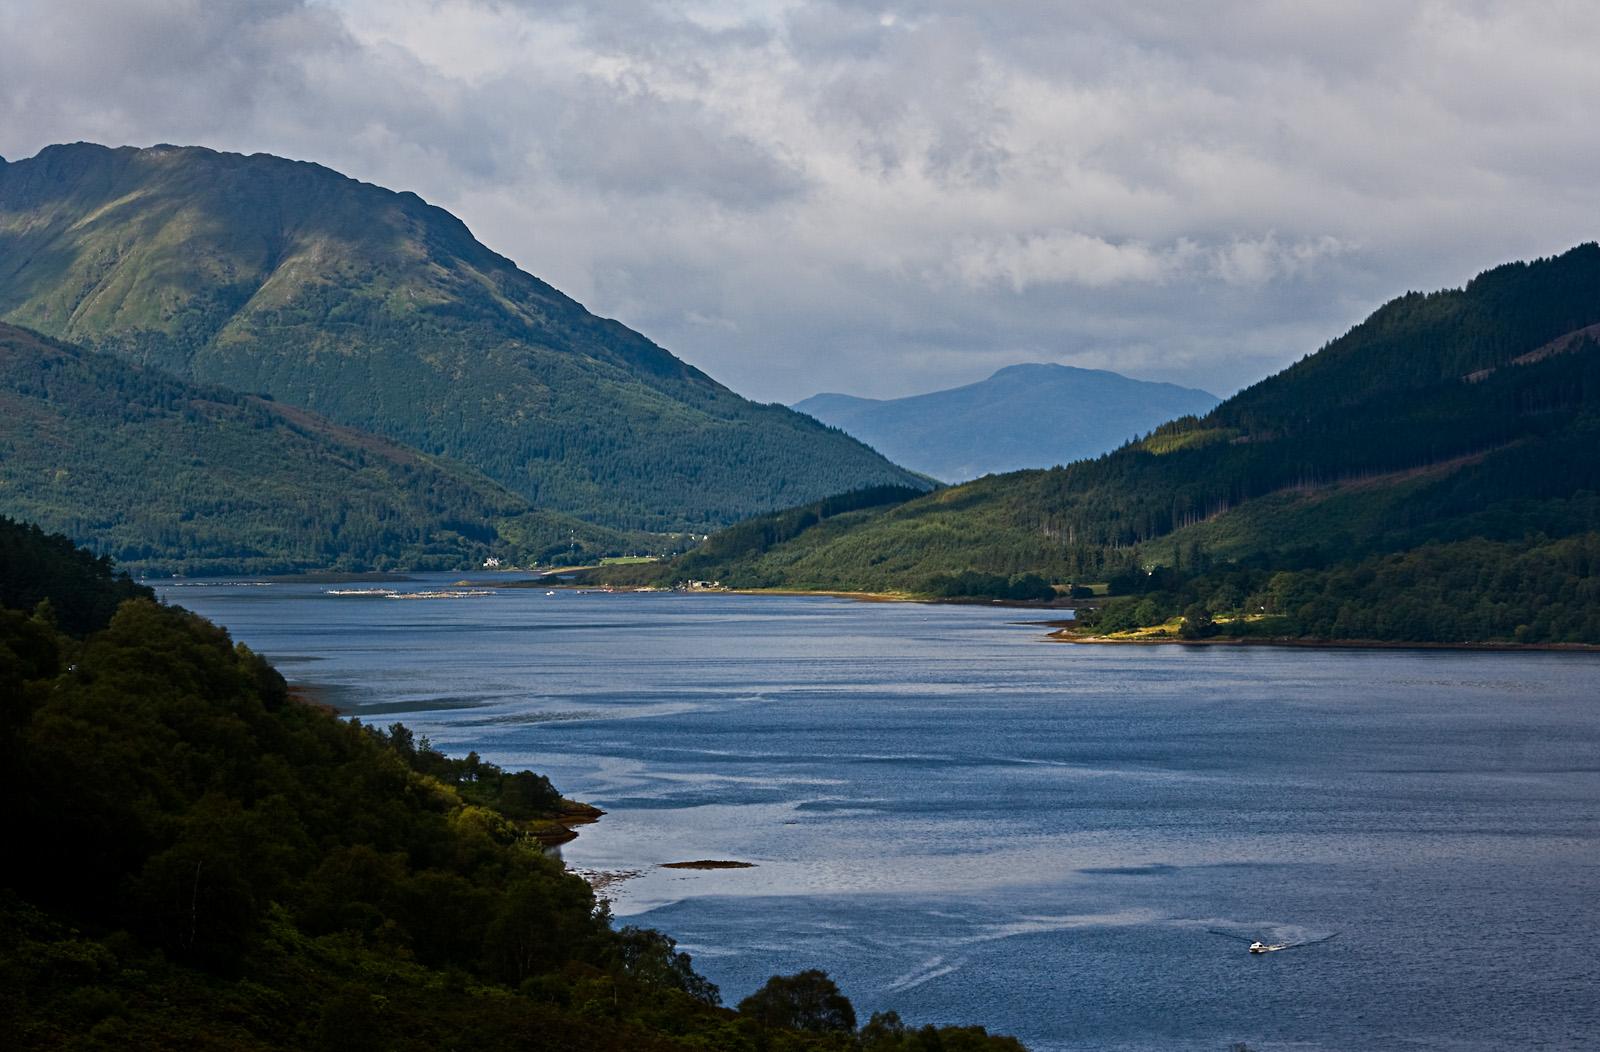 Schottland XXIX - Loch Leven